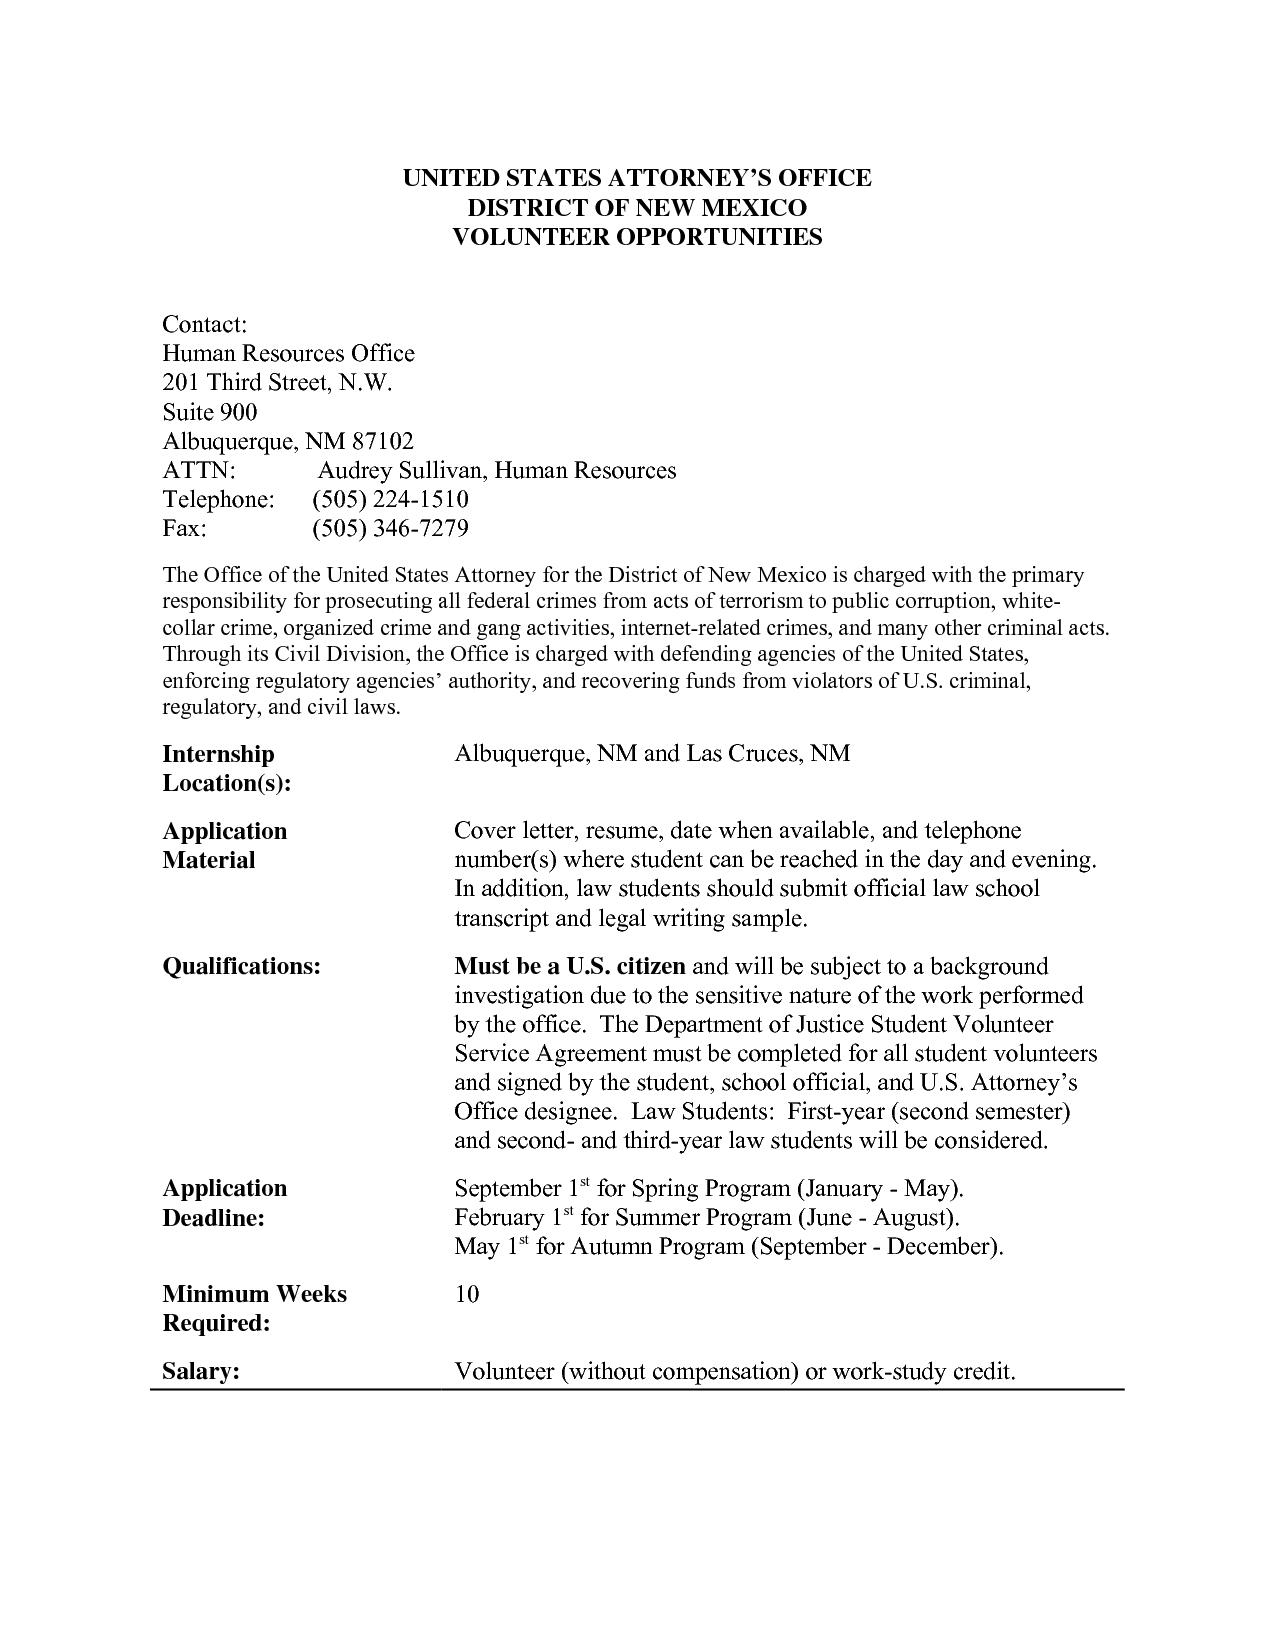 work experience agenda template  u2022 invitation template ideas